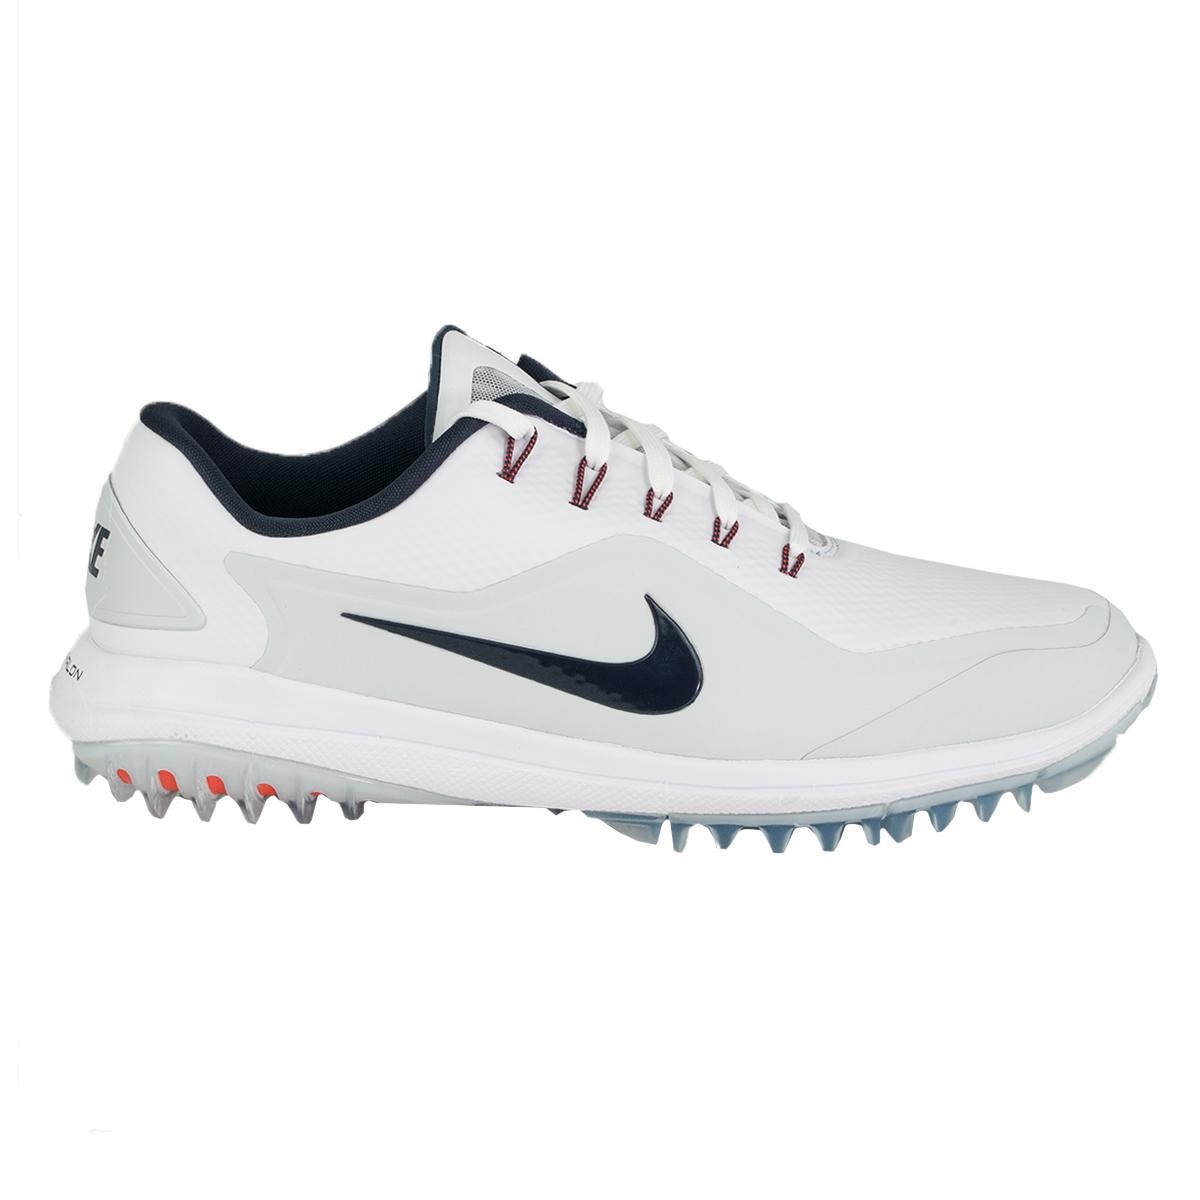 00955061f70f Details about Nike Men s Lunar Control Vapor 2 Golf Shoes White Thunder  Blue 9 W